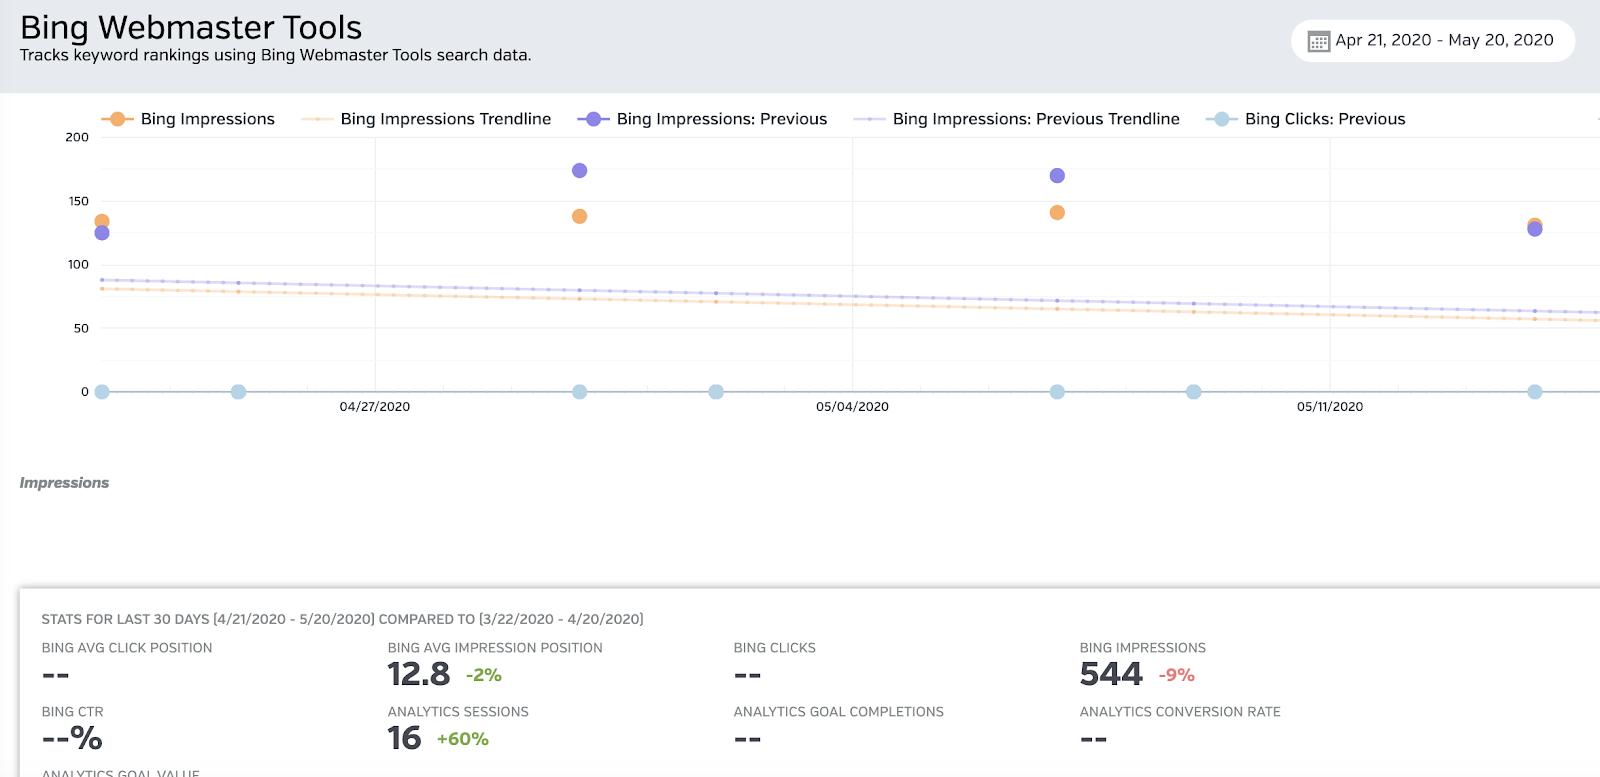 Bing Webmaster Tools: Click position, Impressions, Trends, etc.